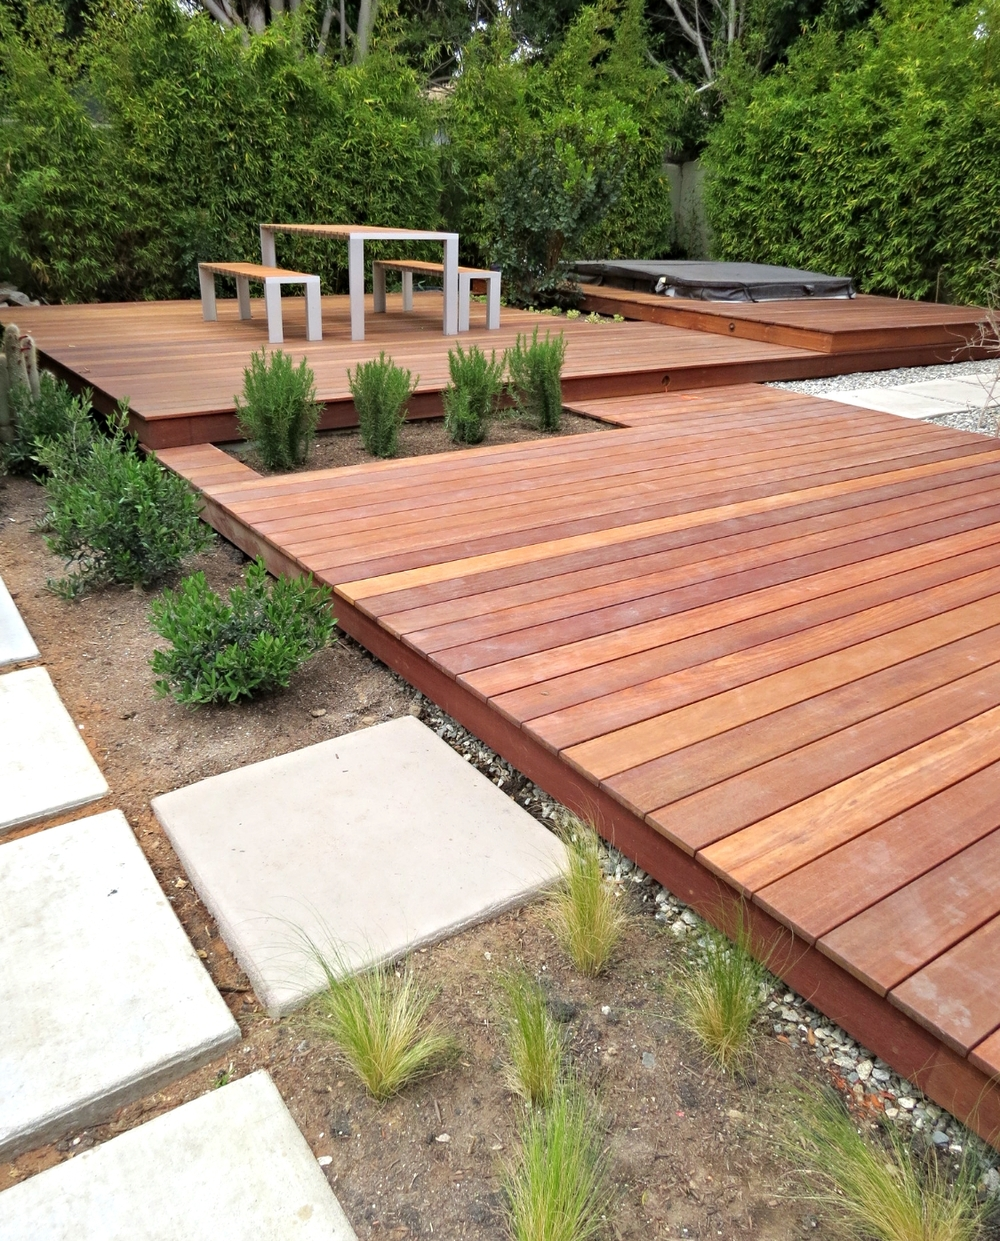 Lake Modern Deck And Table